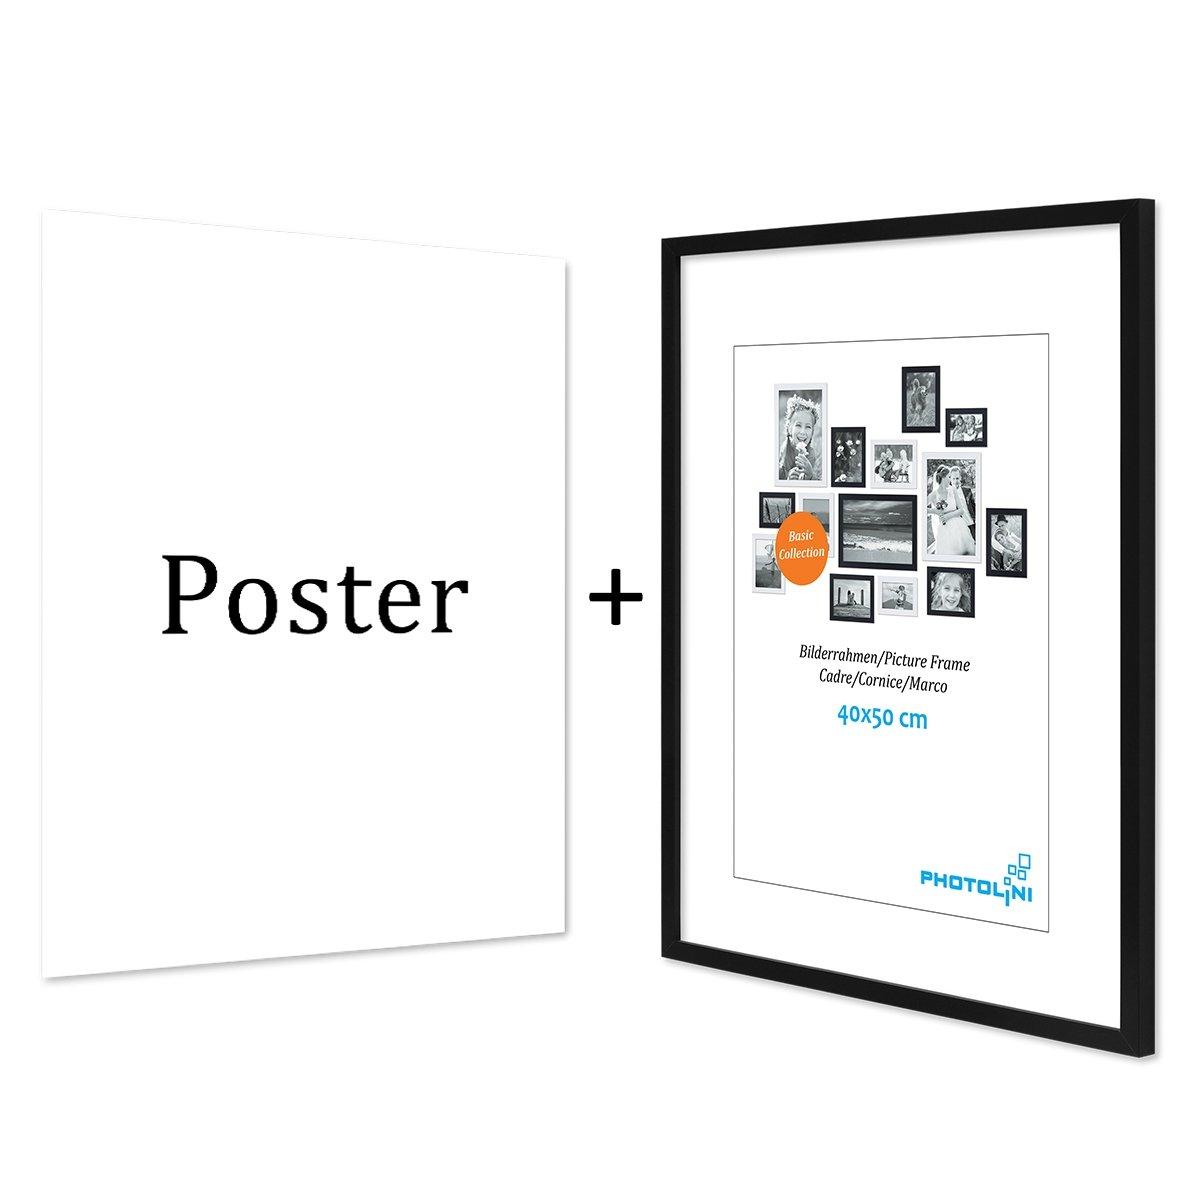 Großartig Bilderrahmung Klasse Bilder - Rahmen Ideen ...